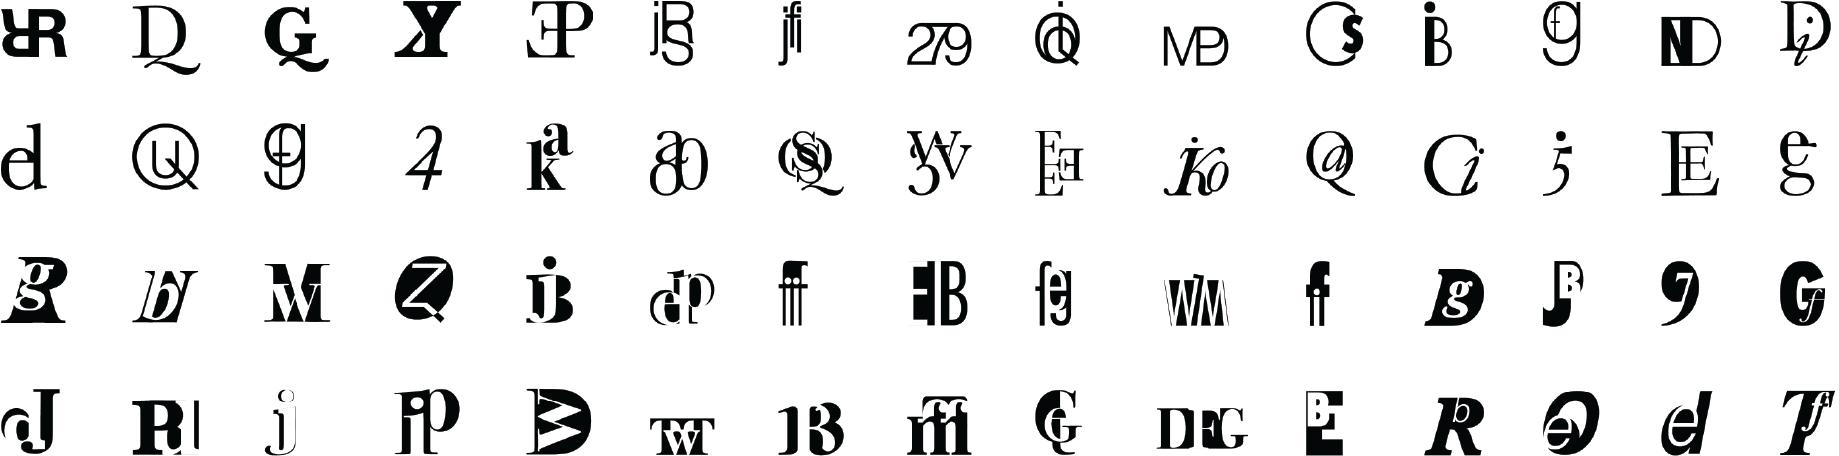 Cyrena Johnson Design Type Symbols